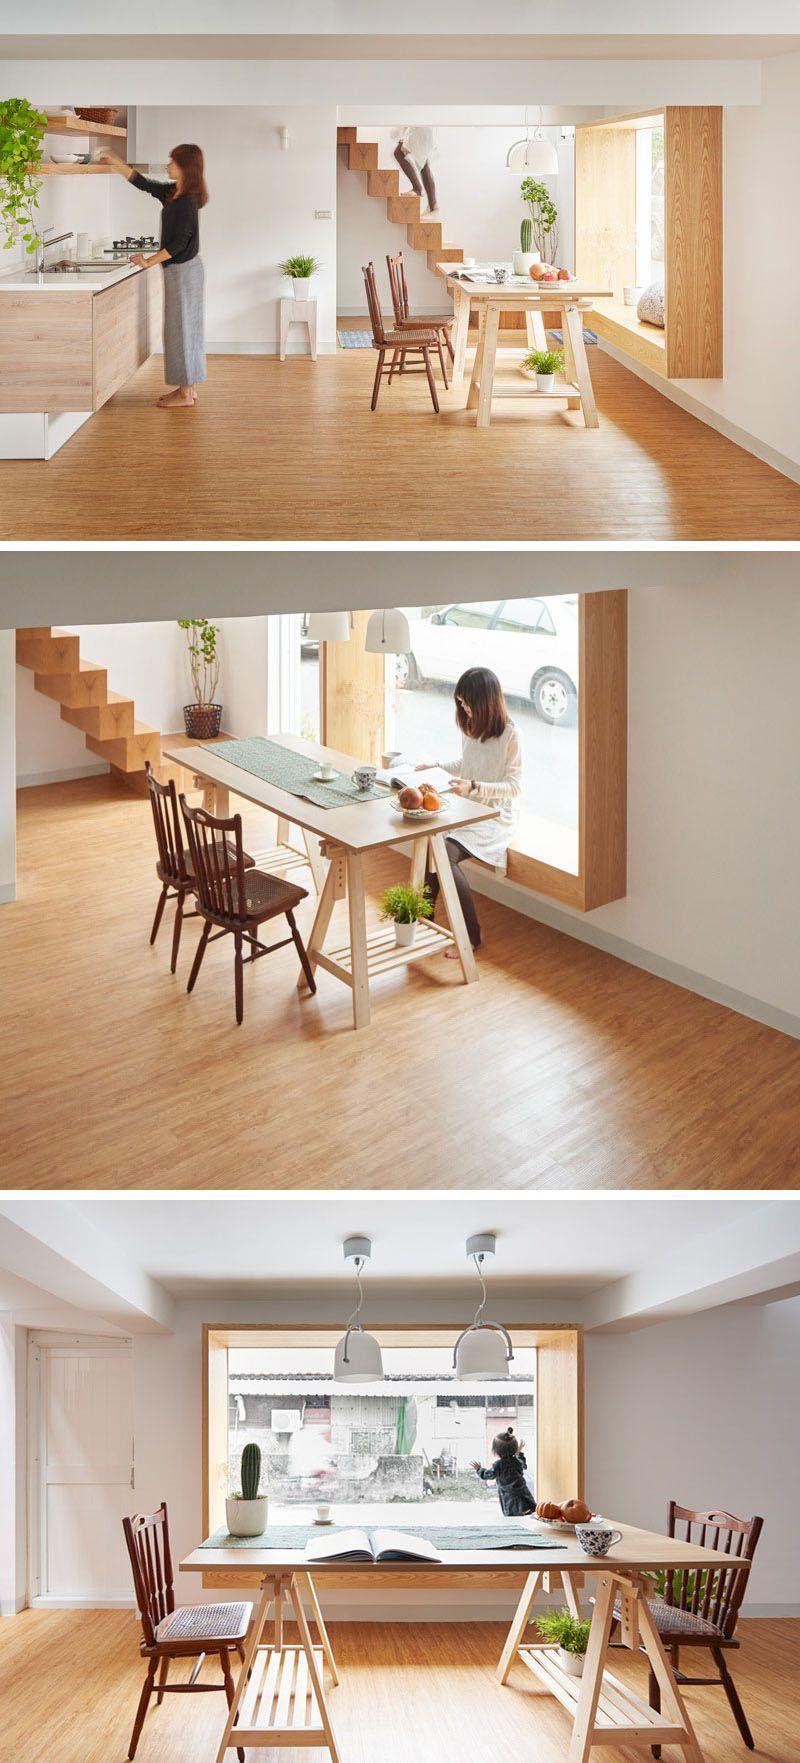 Pin de Aor Piraya en Japanease Style | Pinterest | Madera pared ...